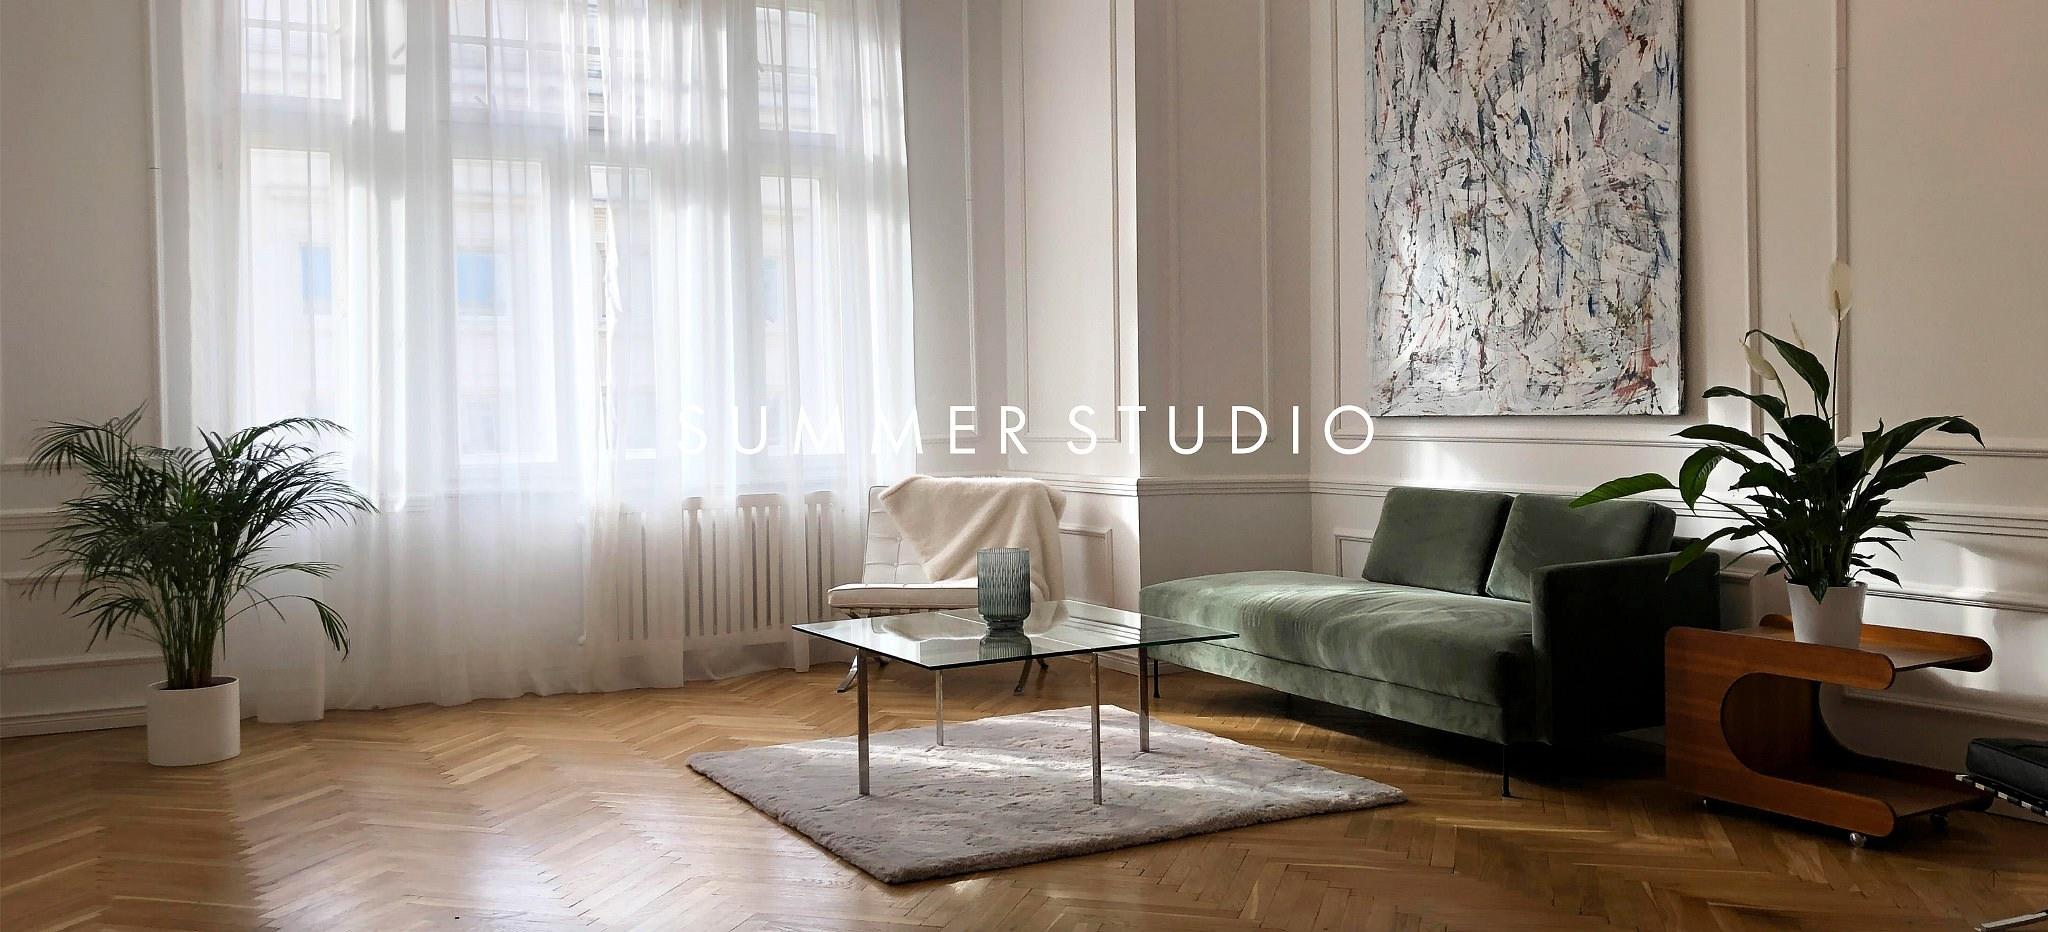 Summer Studio Warszawa